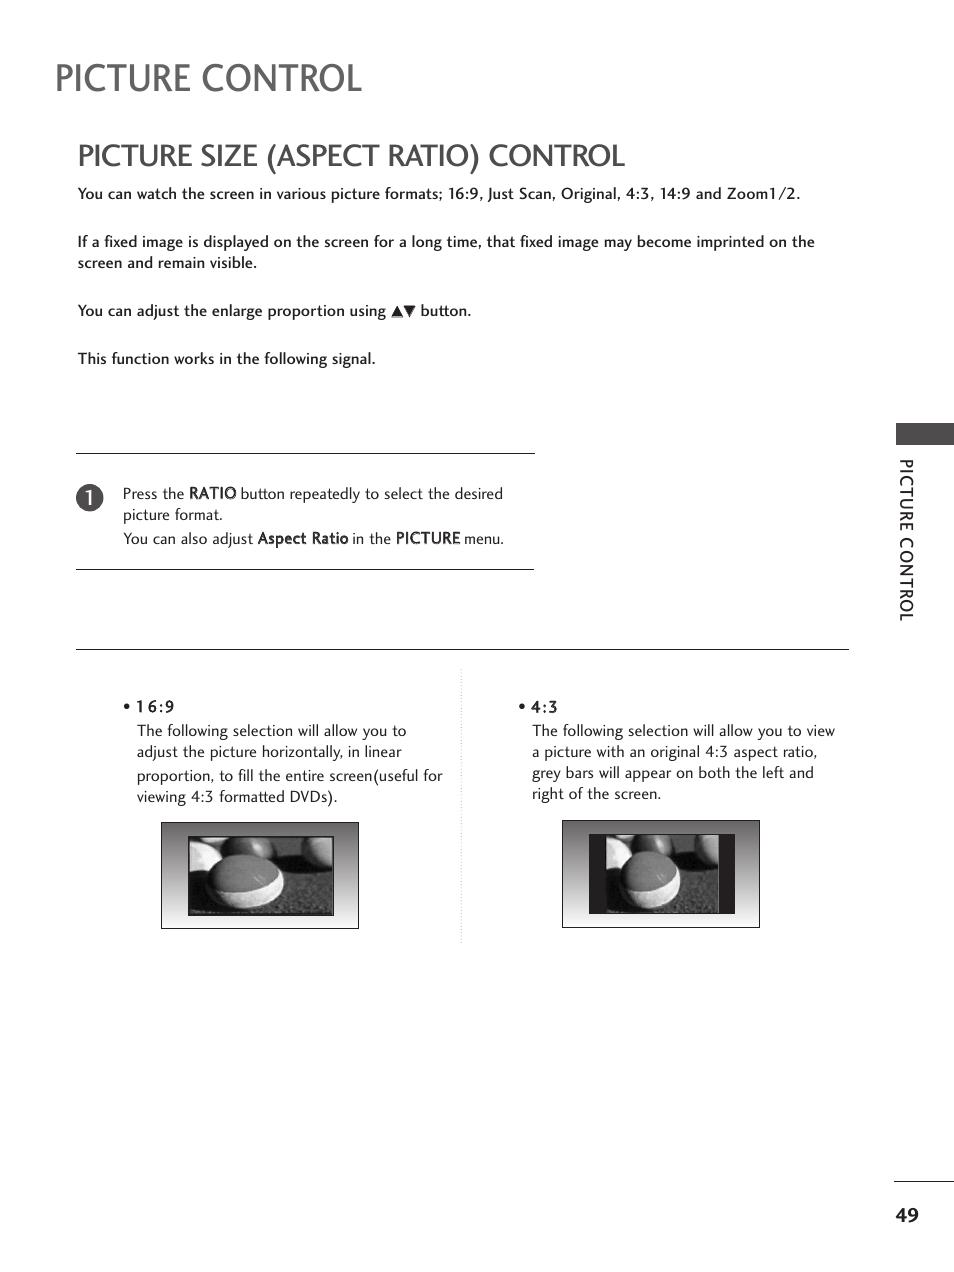 Picture control, Picture size (aspect ratio) control | LG